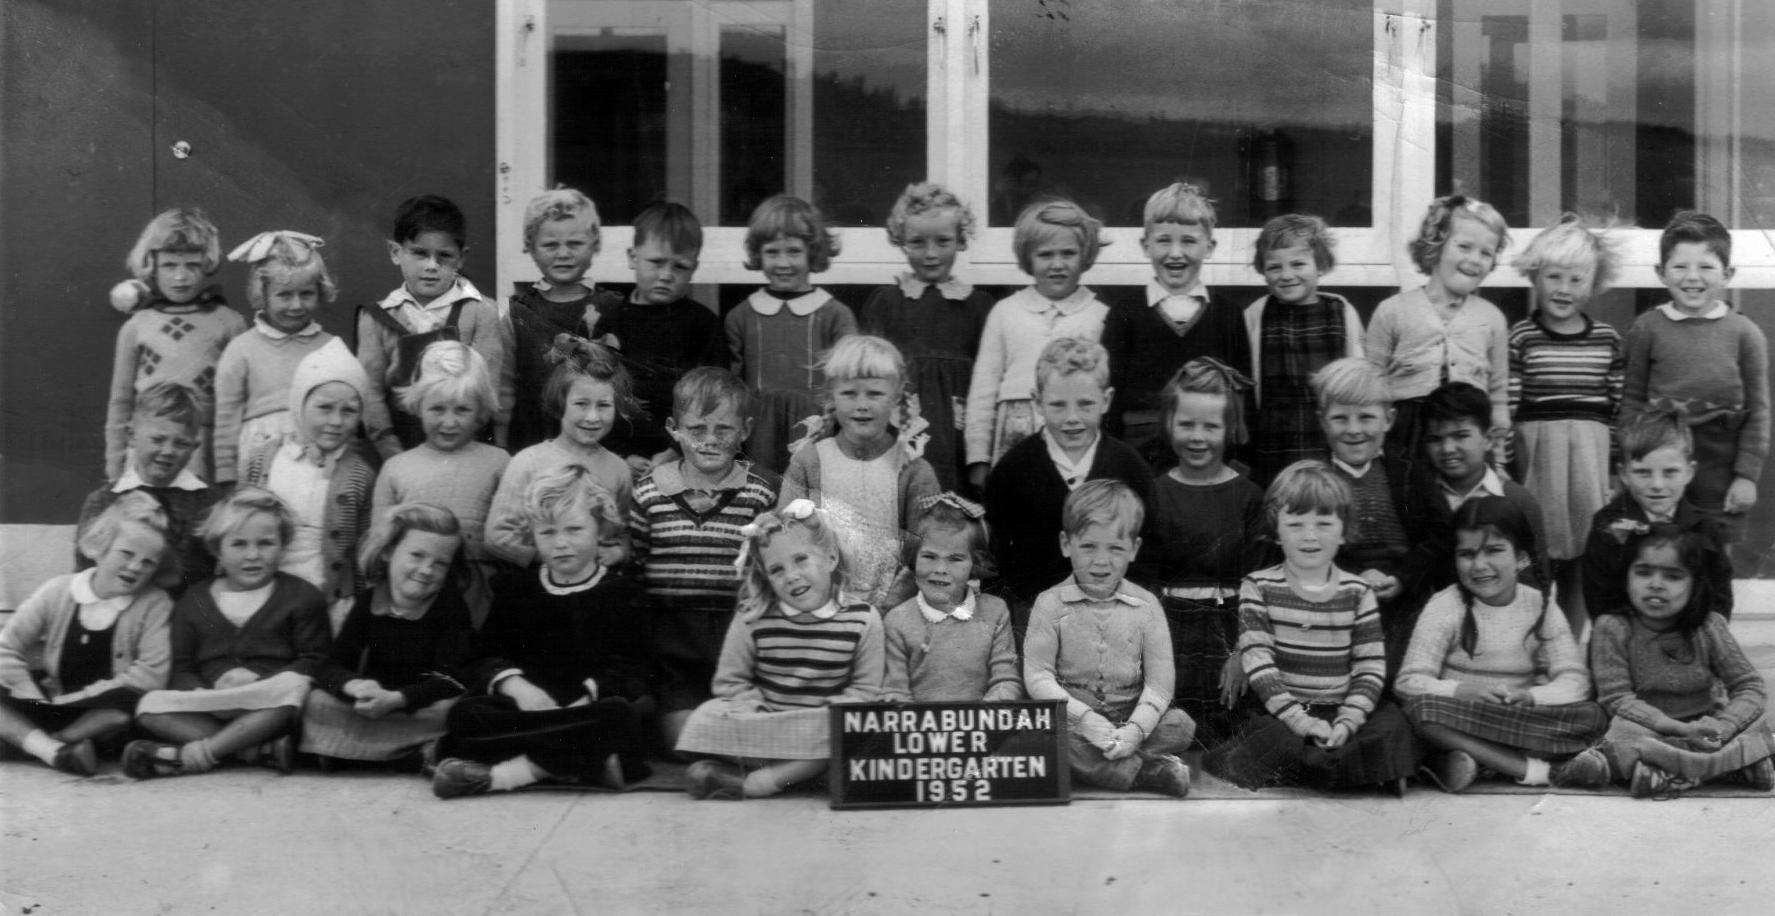 Narrabundah Infants School